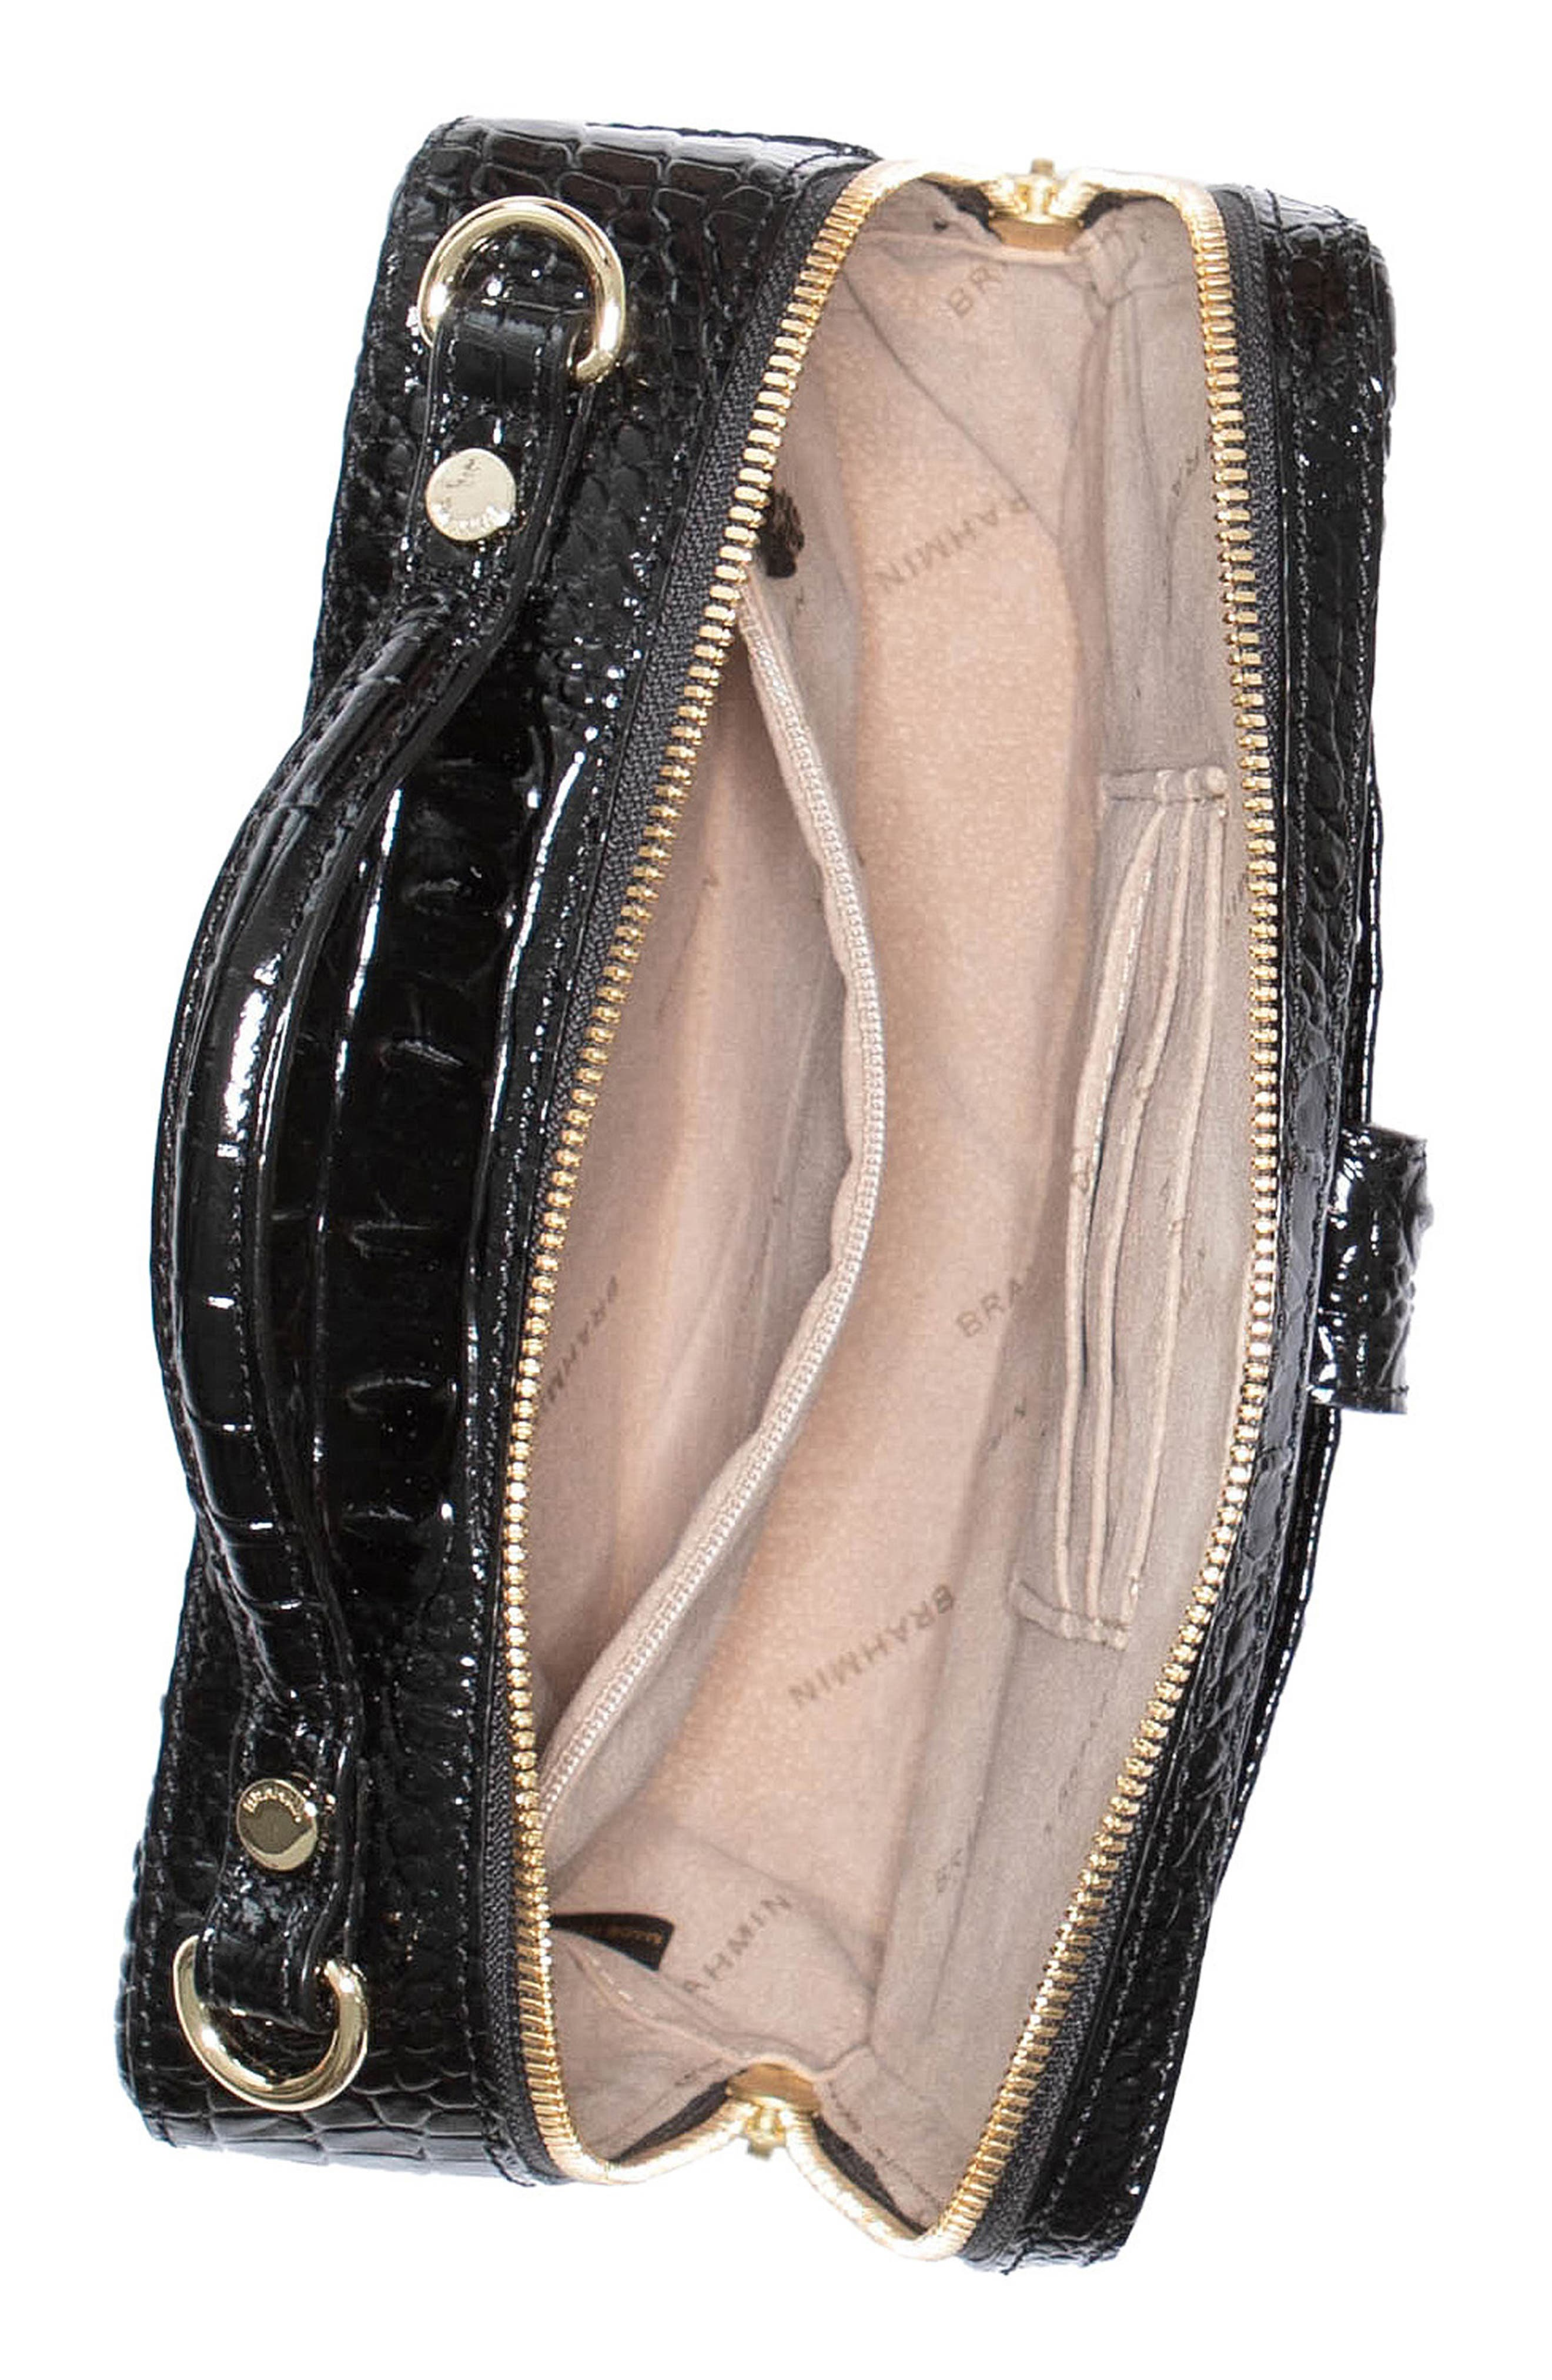 Evie Croc Embossed Leather Top Handle Bag,                             Alternate thumbnail 3, color,                             BLACK MEMBOURNE